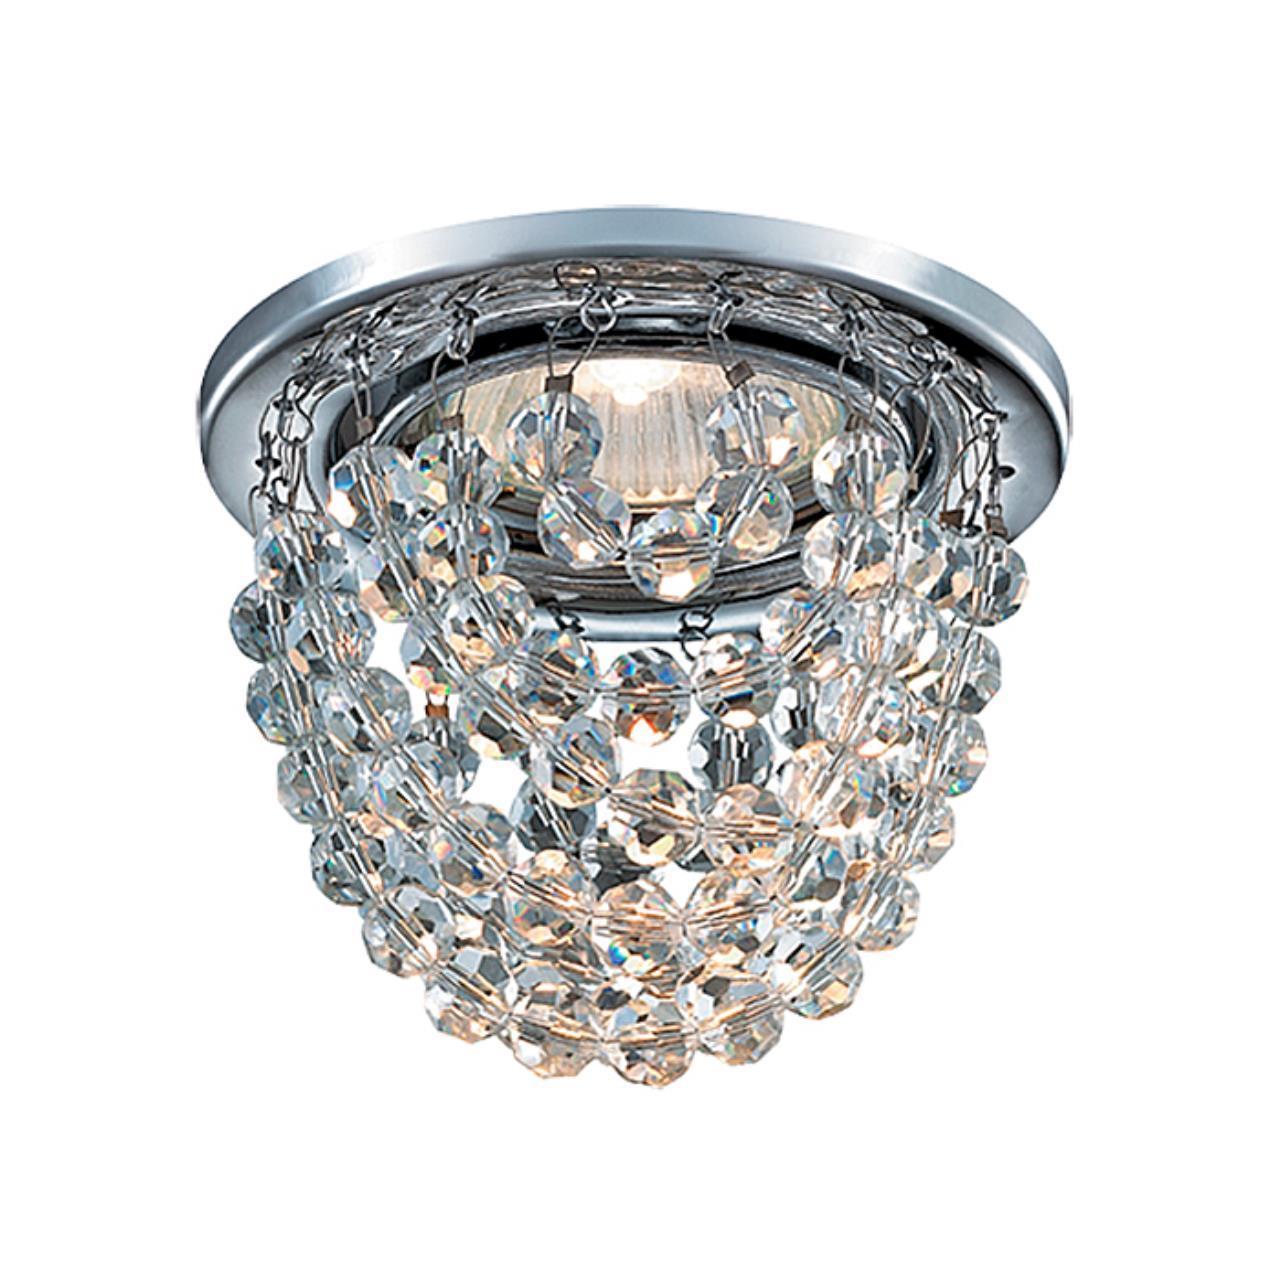 369778 SPOT NT12 123 хром Встраиваемый светильник IP20 GX5.3 50W 12V JINNI